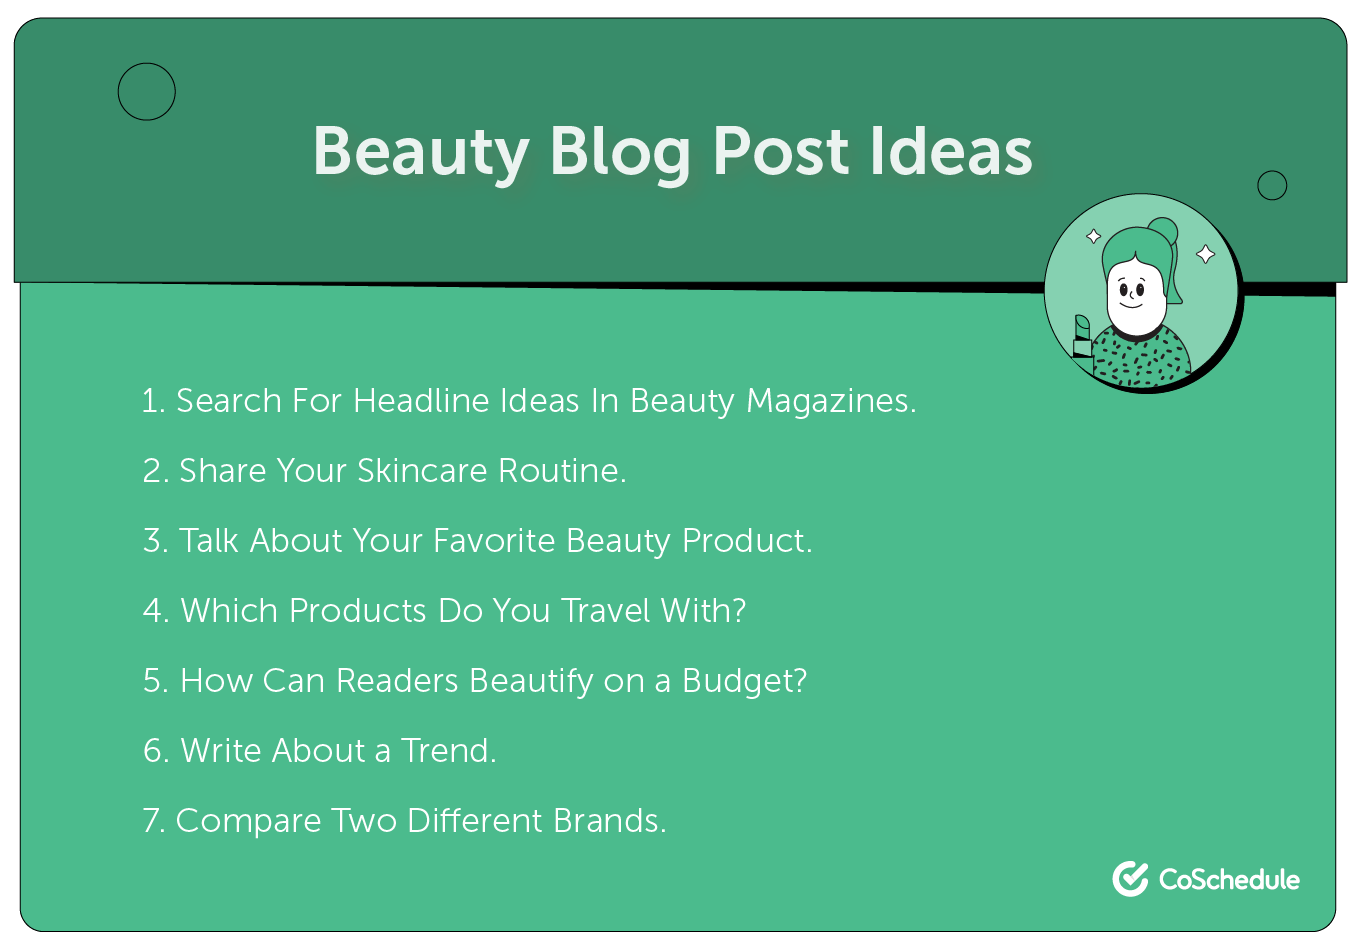 Beauty blog post ideas.